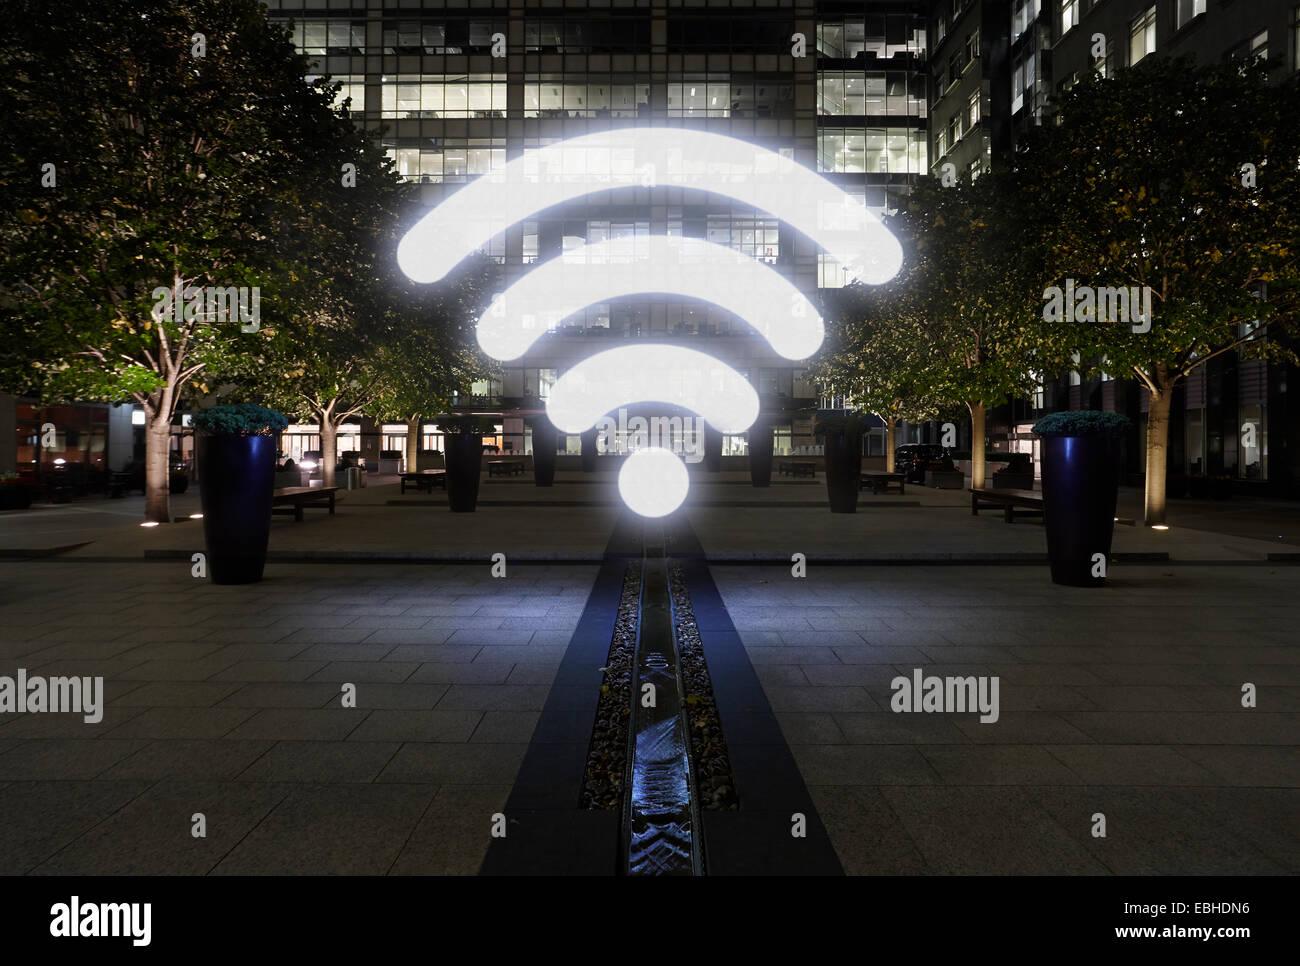 Glowing wifi icon in city street at night, London, UK - Stock Image